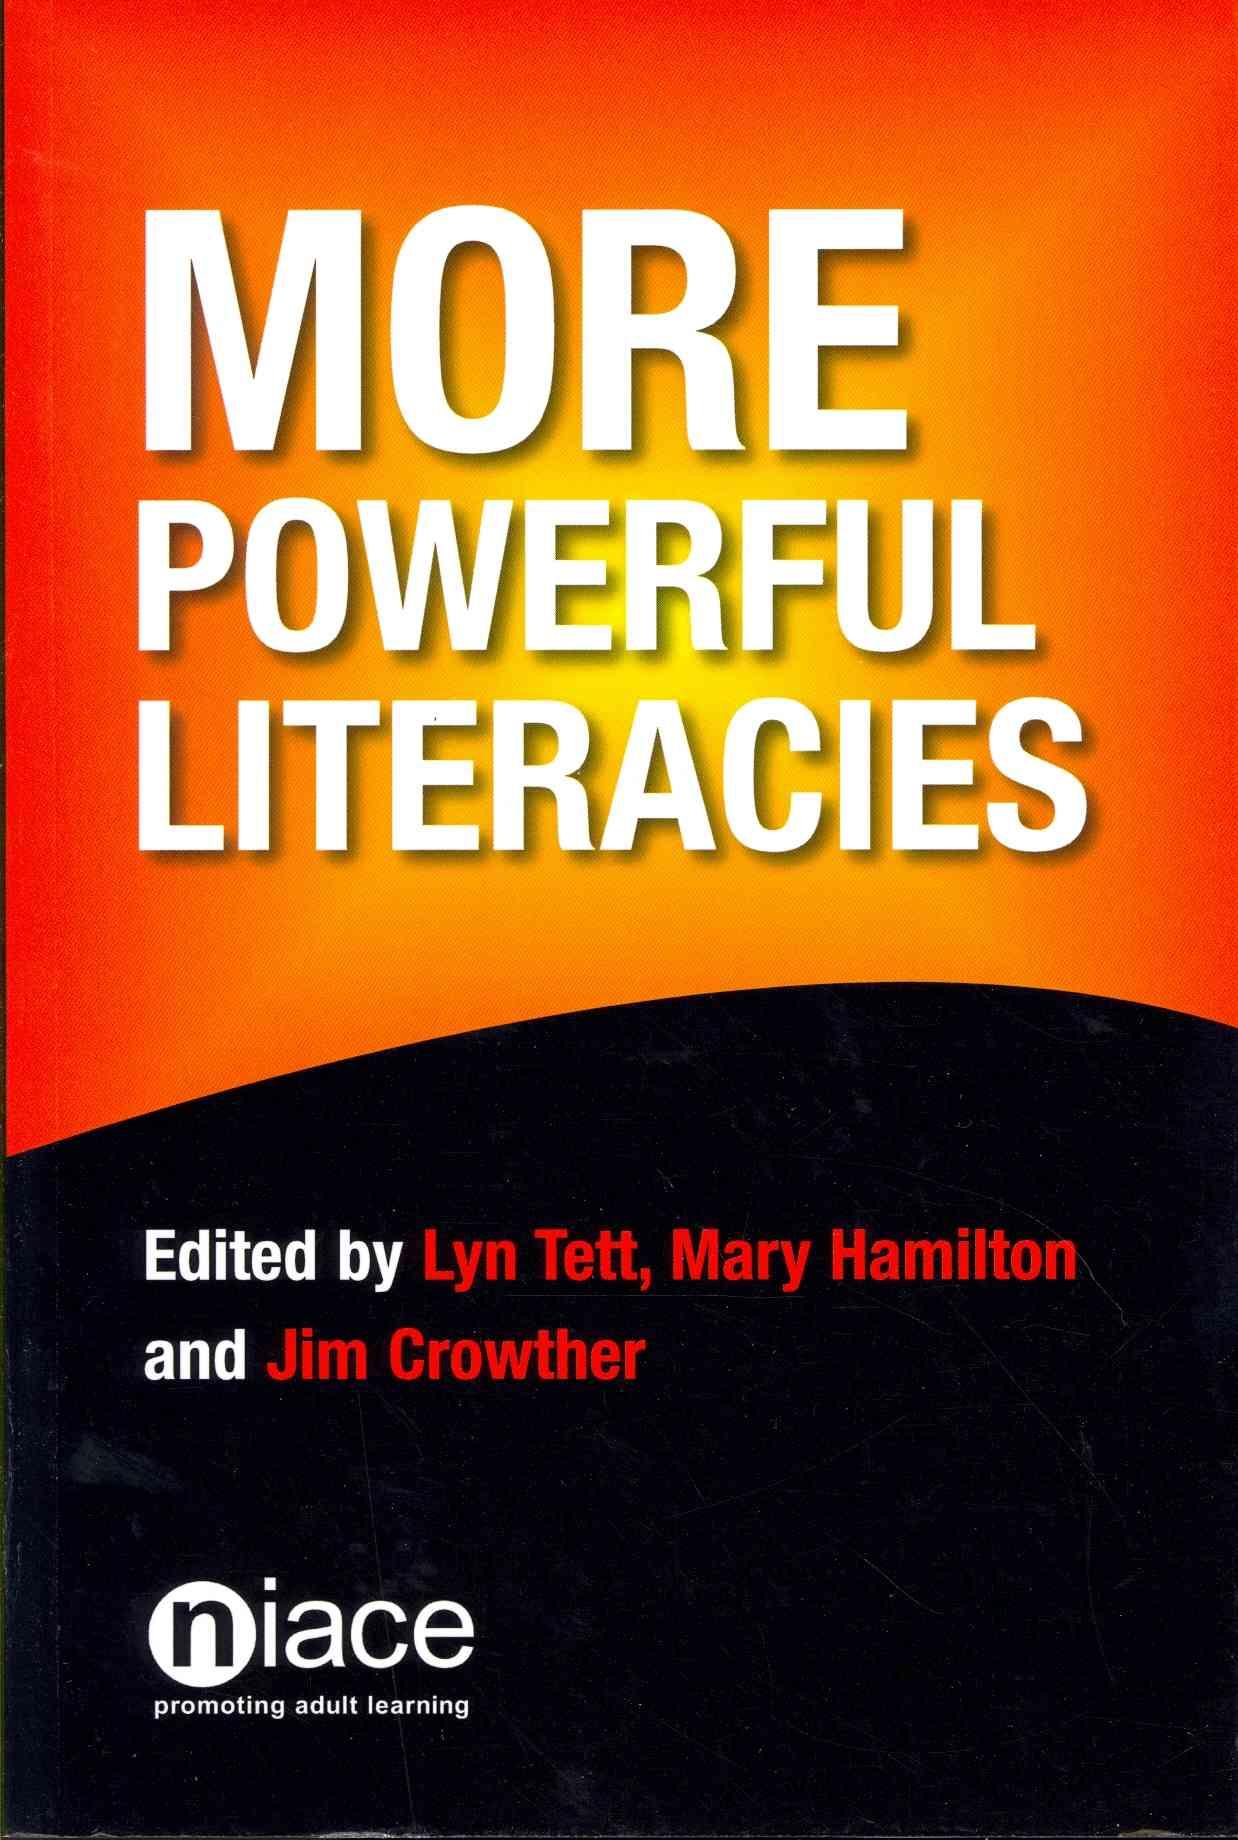 More Powerful Literacies (Paperback)